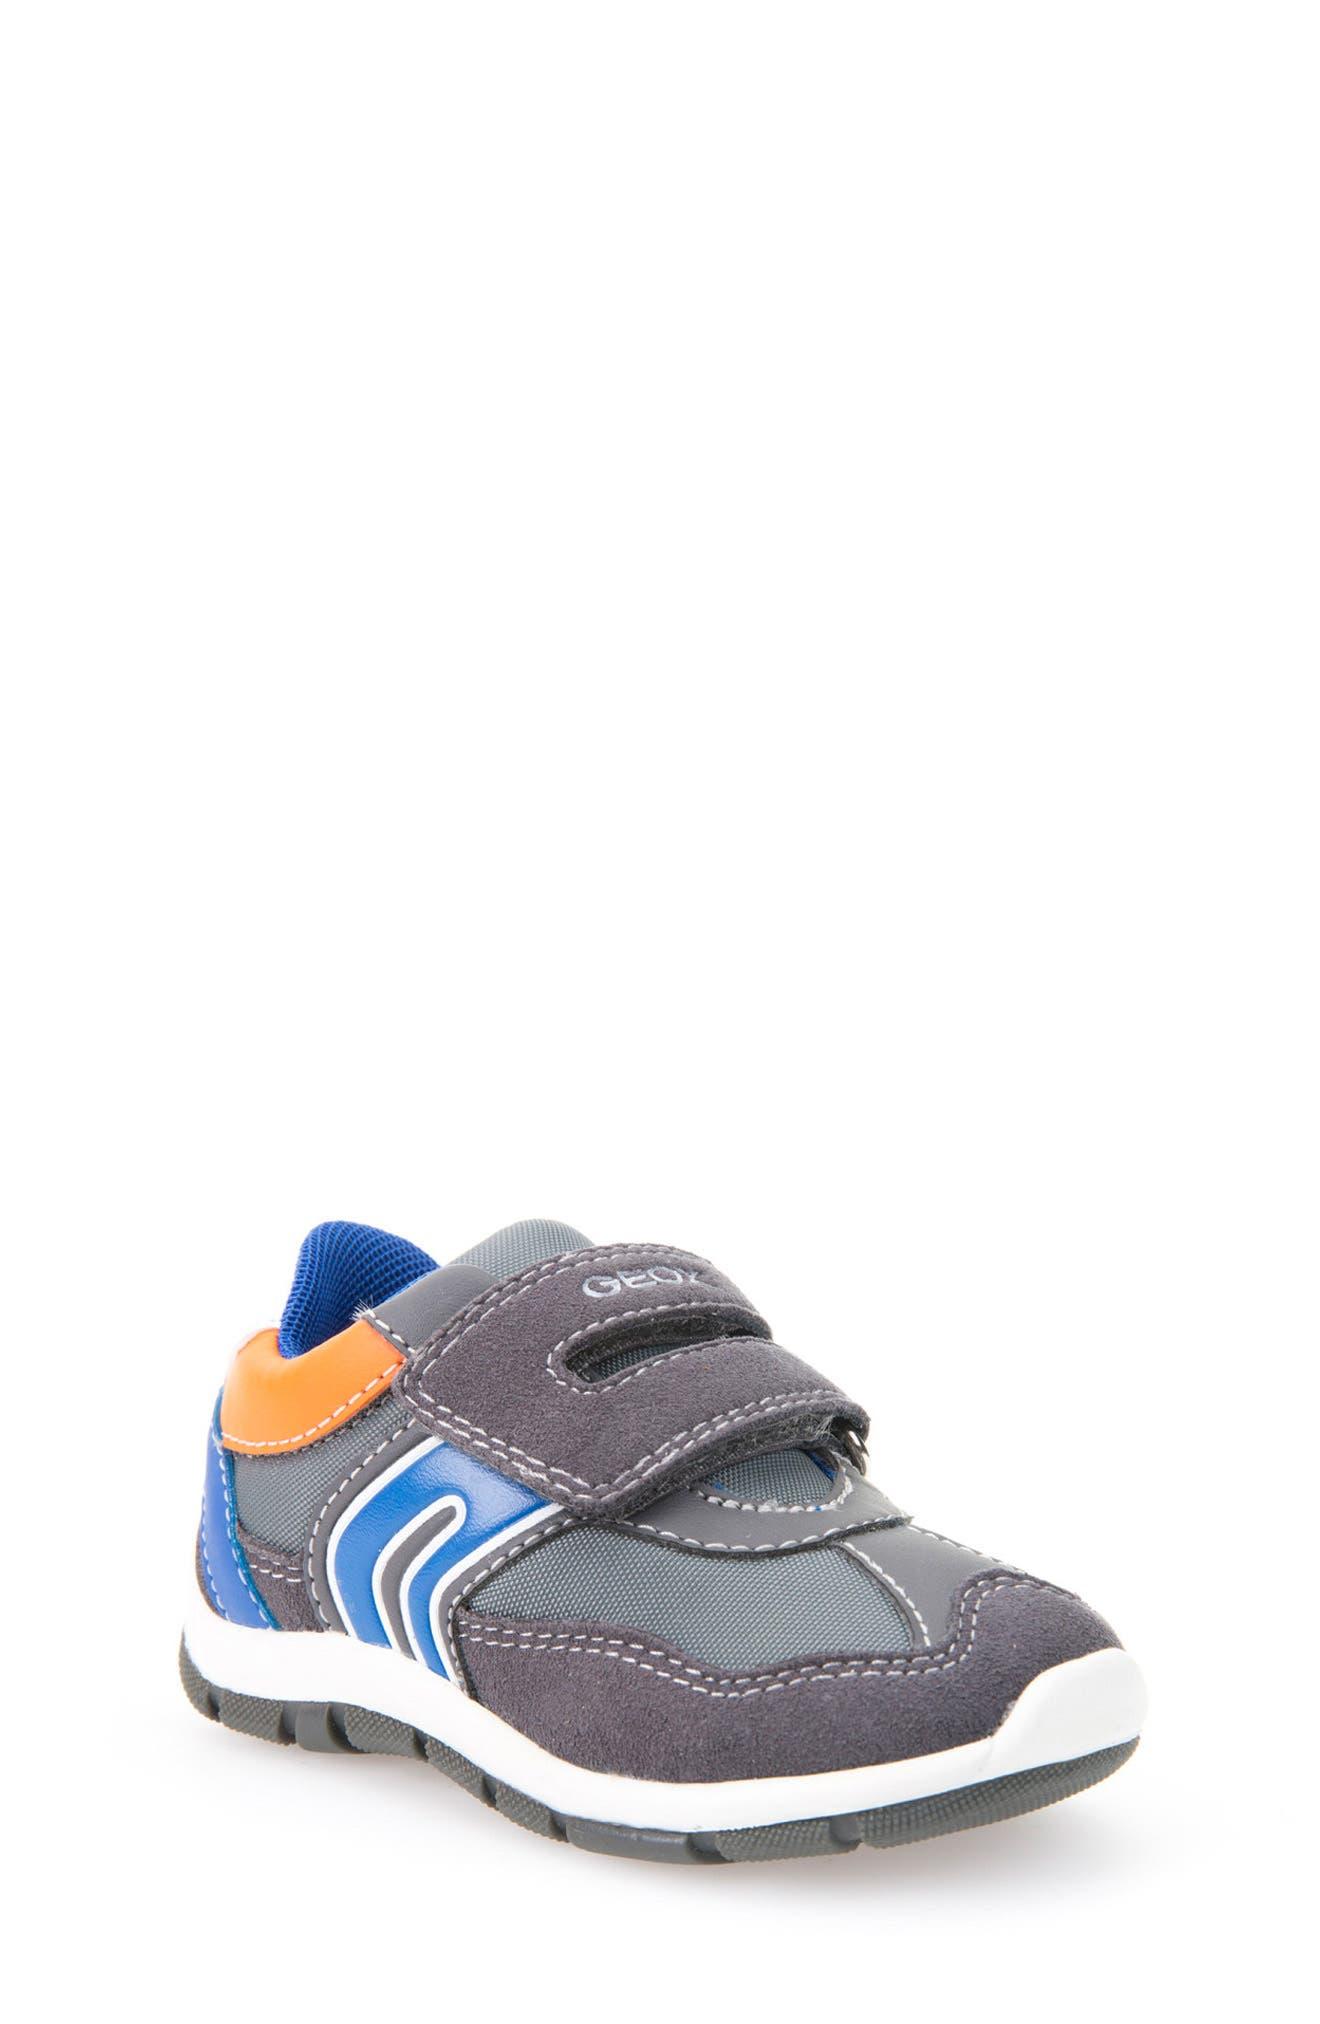 Shaax Sneaker,                         Main,                         color, 073